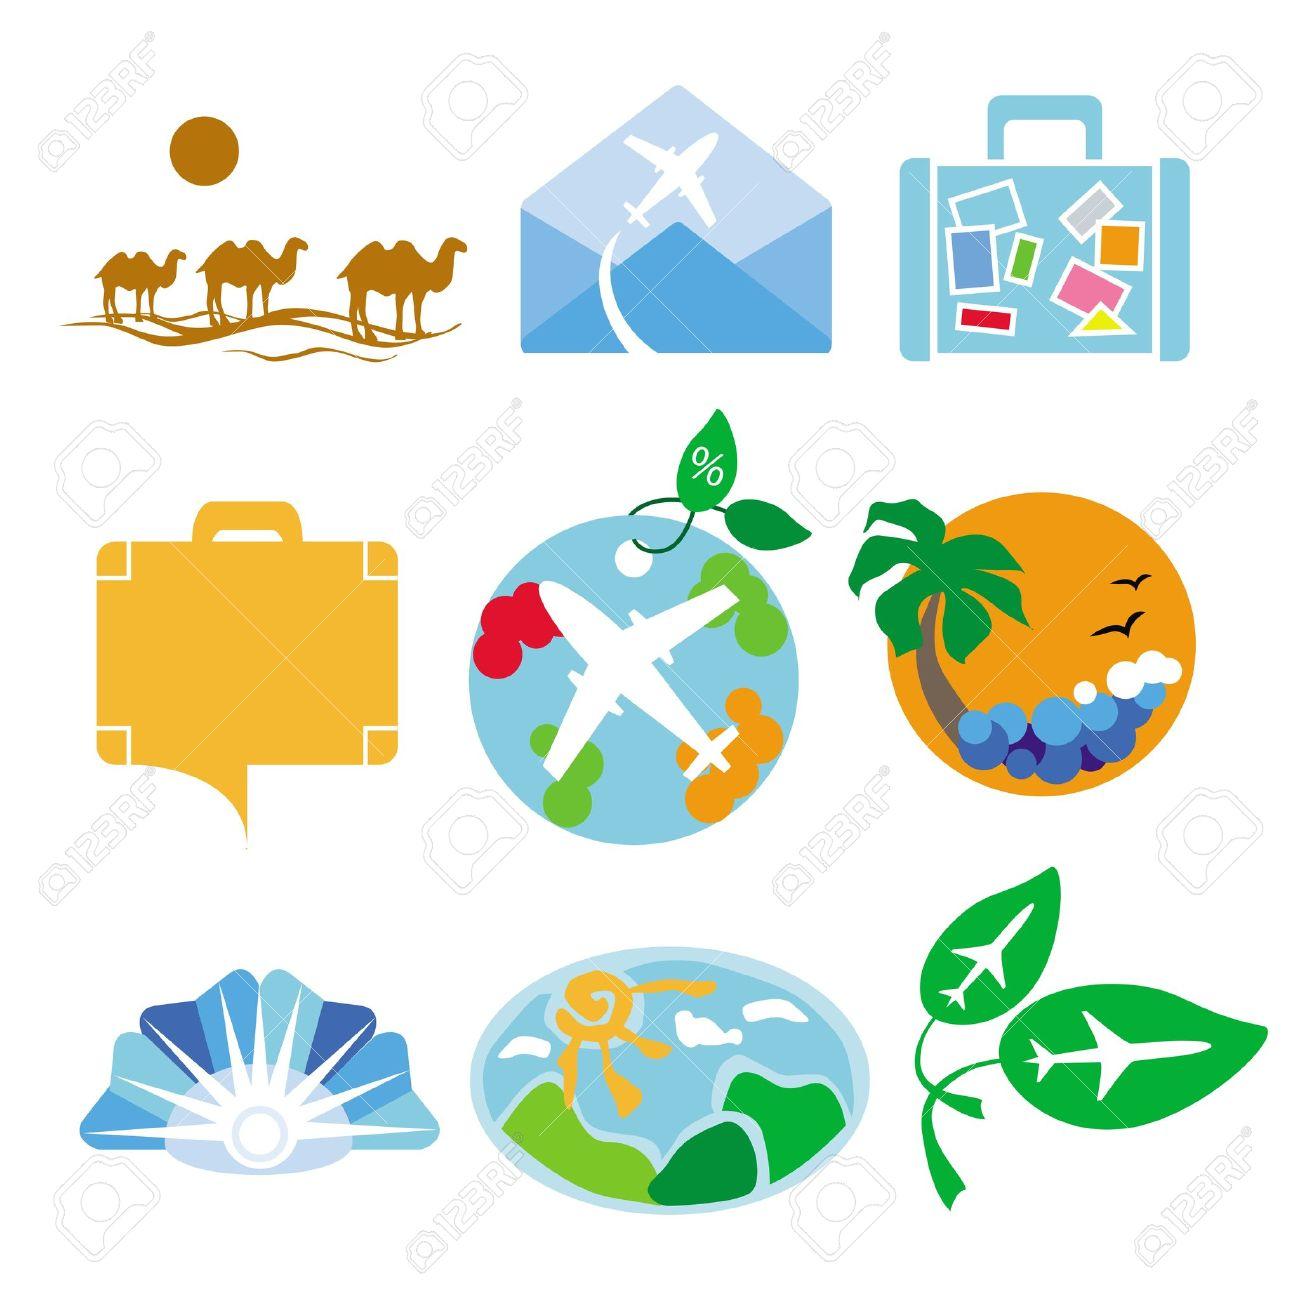 Travel Agency Logo Stock Photos Images. Royalty Free Travel Agency ...